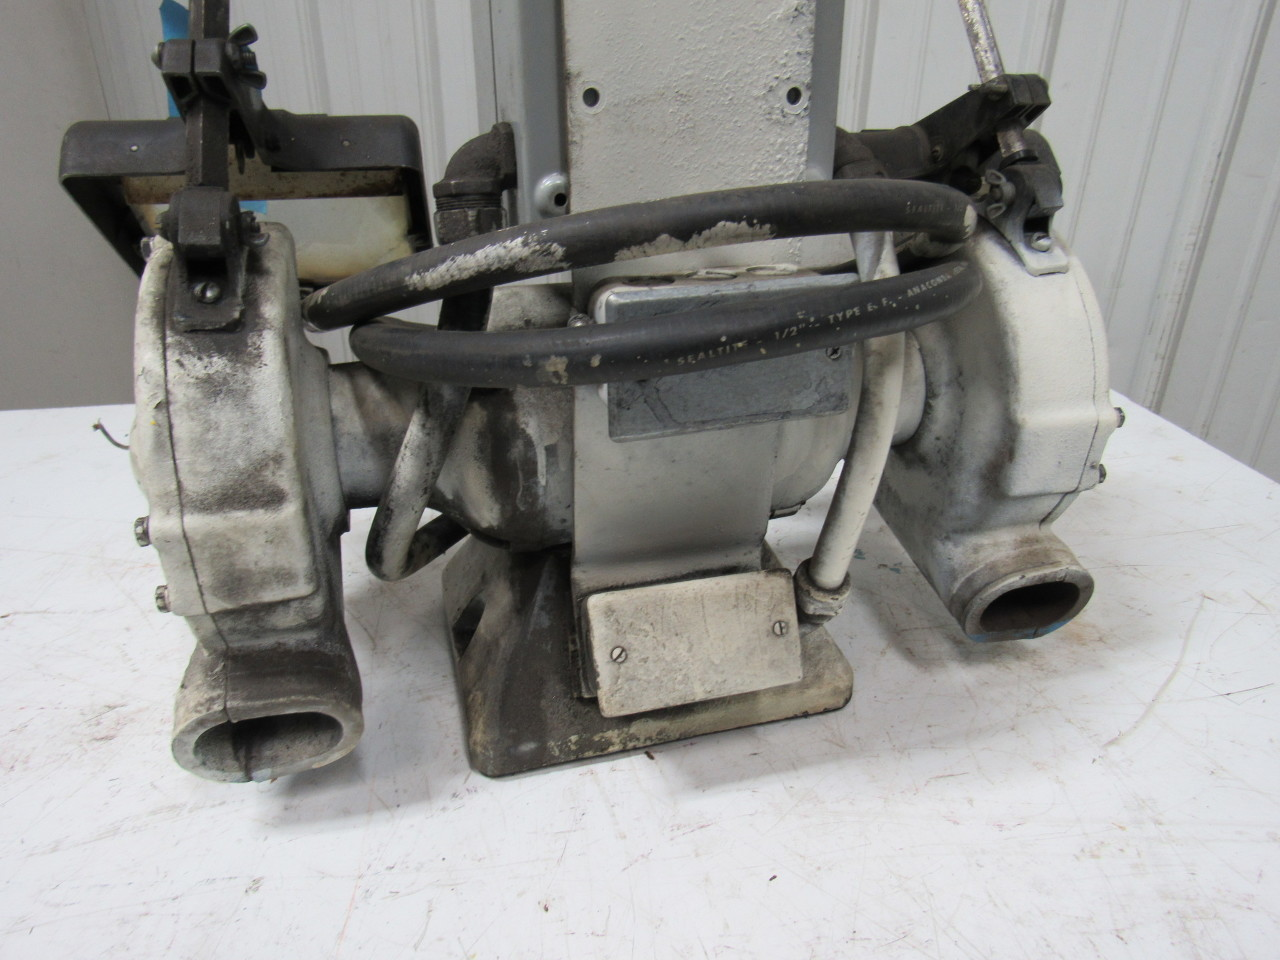 Baldor 7309d Industrial 7 Deluxe Bench Grinder 220 230 460v 3ph 1 2hp